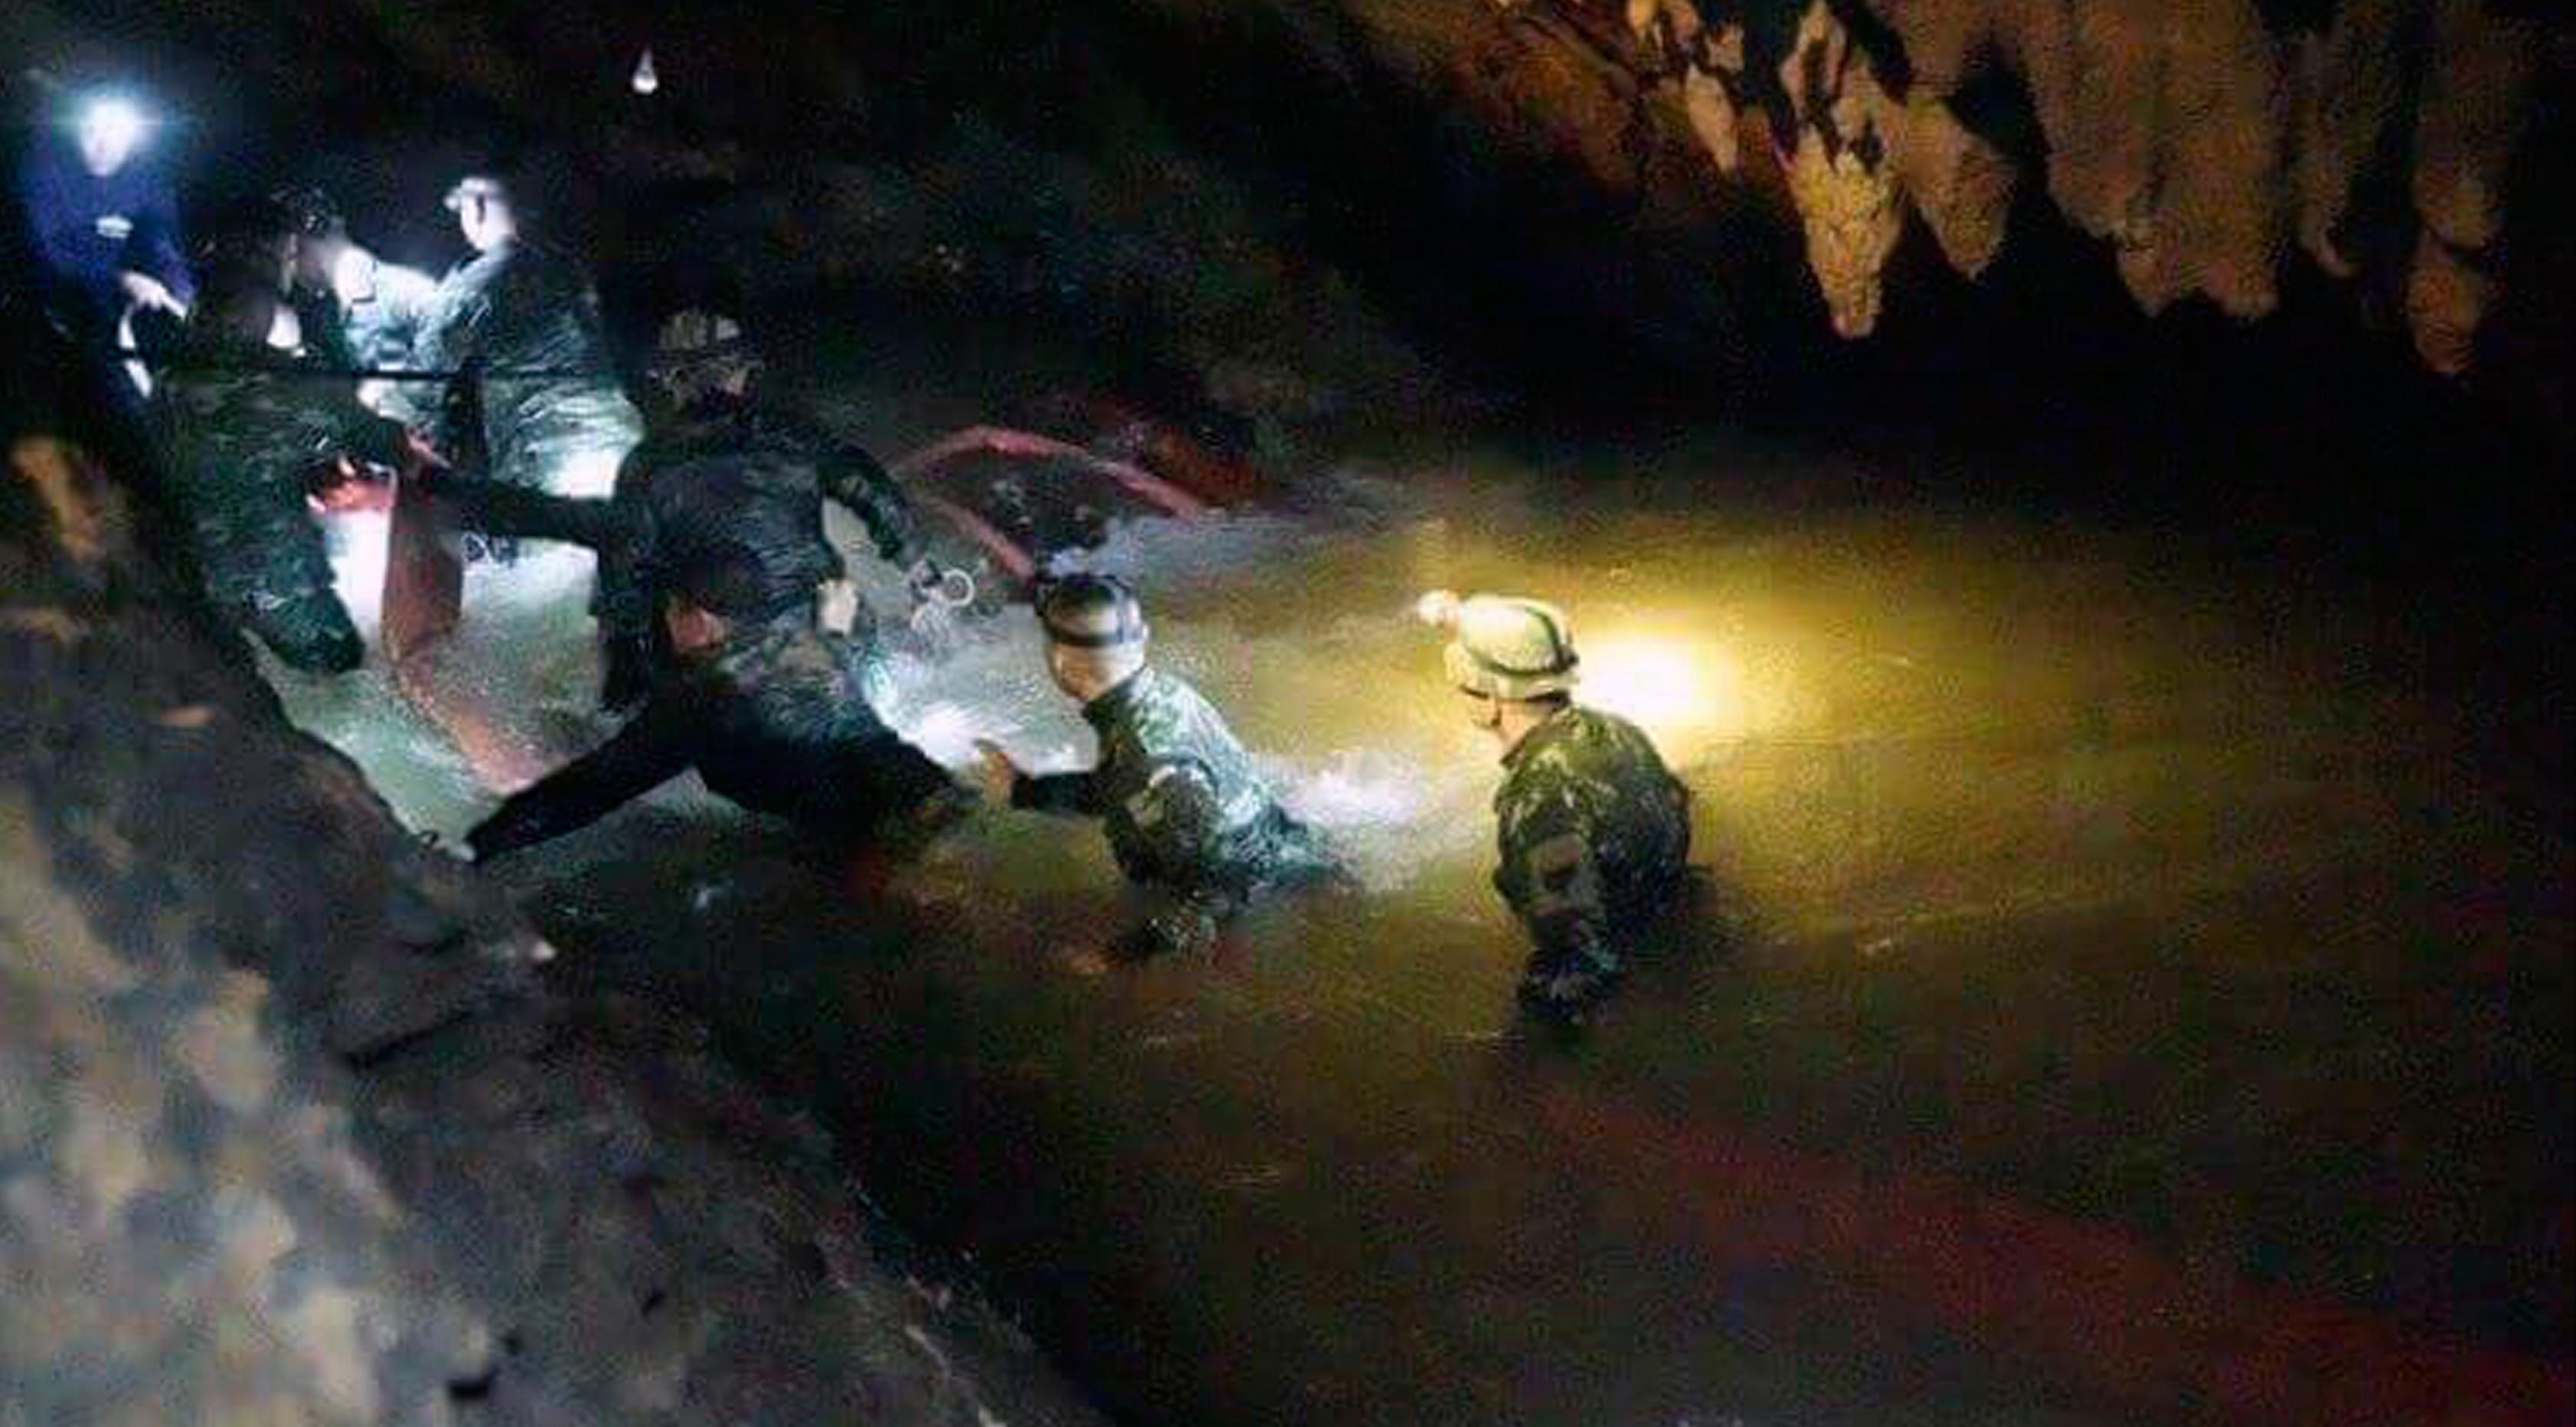 Tim penyelamat Thailand berjuang menyelamatkan tim sepak bola remaja Thailand dan pelatihnya yang terjebak di sebuah gua di Chiang Rai, Thailand, Senin (2/7). (Tham Luang Rescue Operation Center via AP)